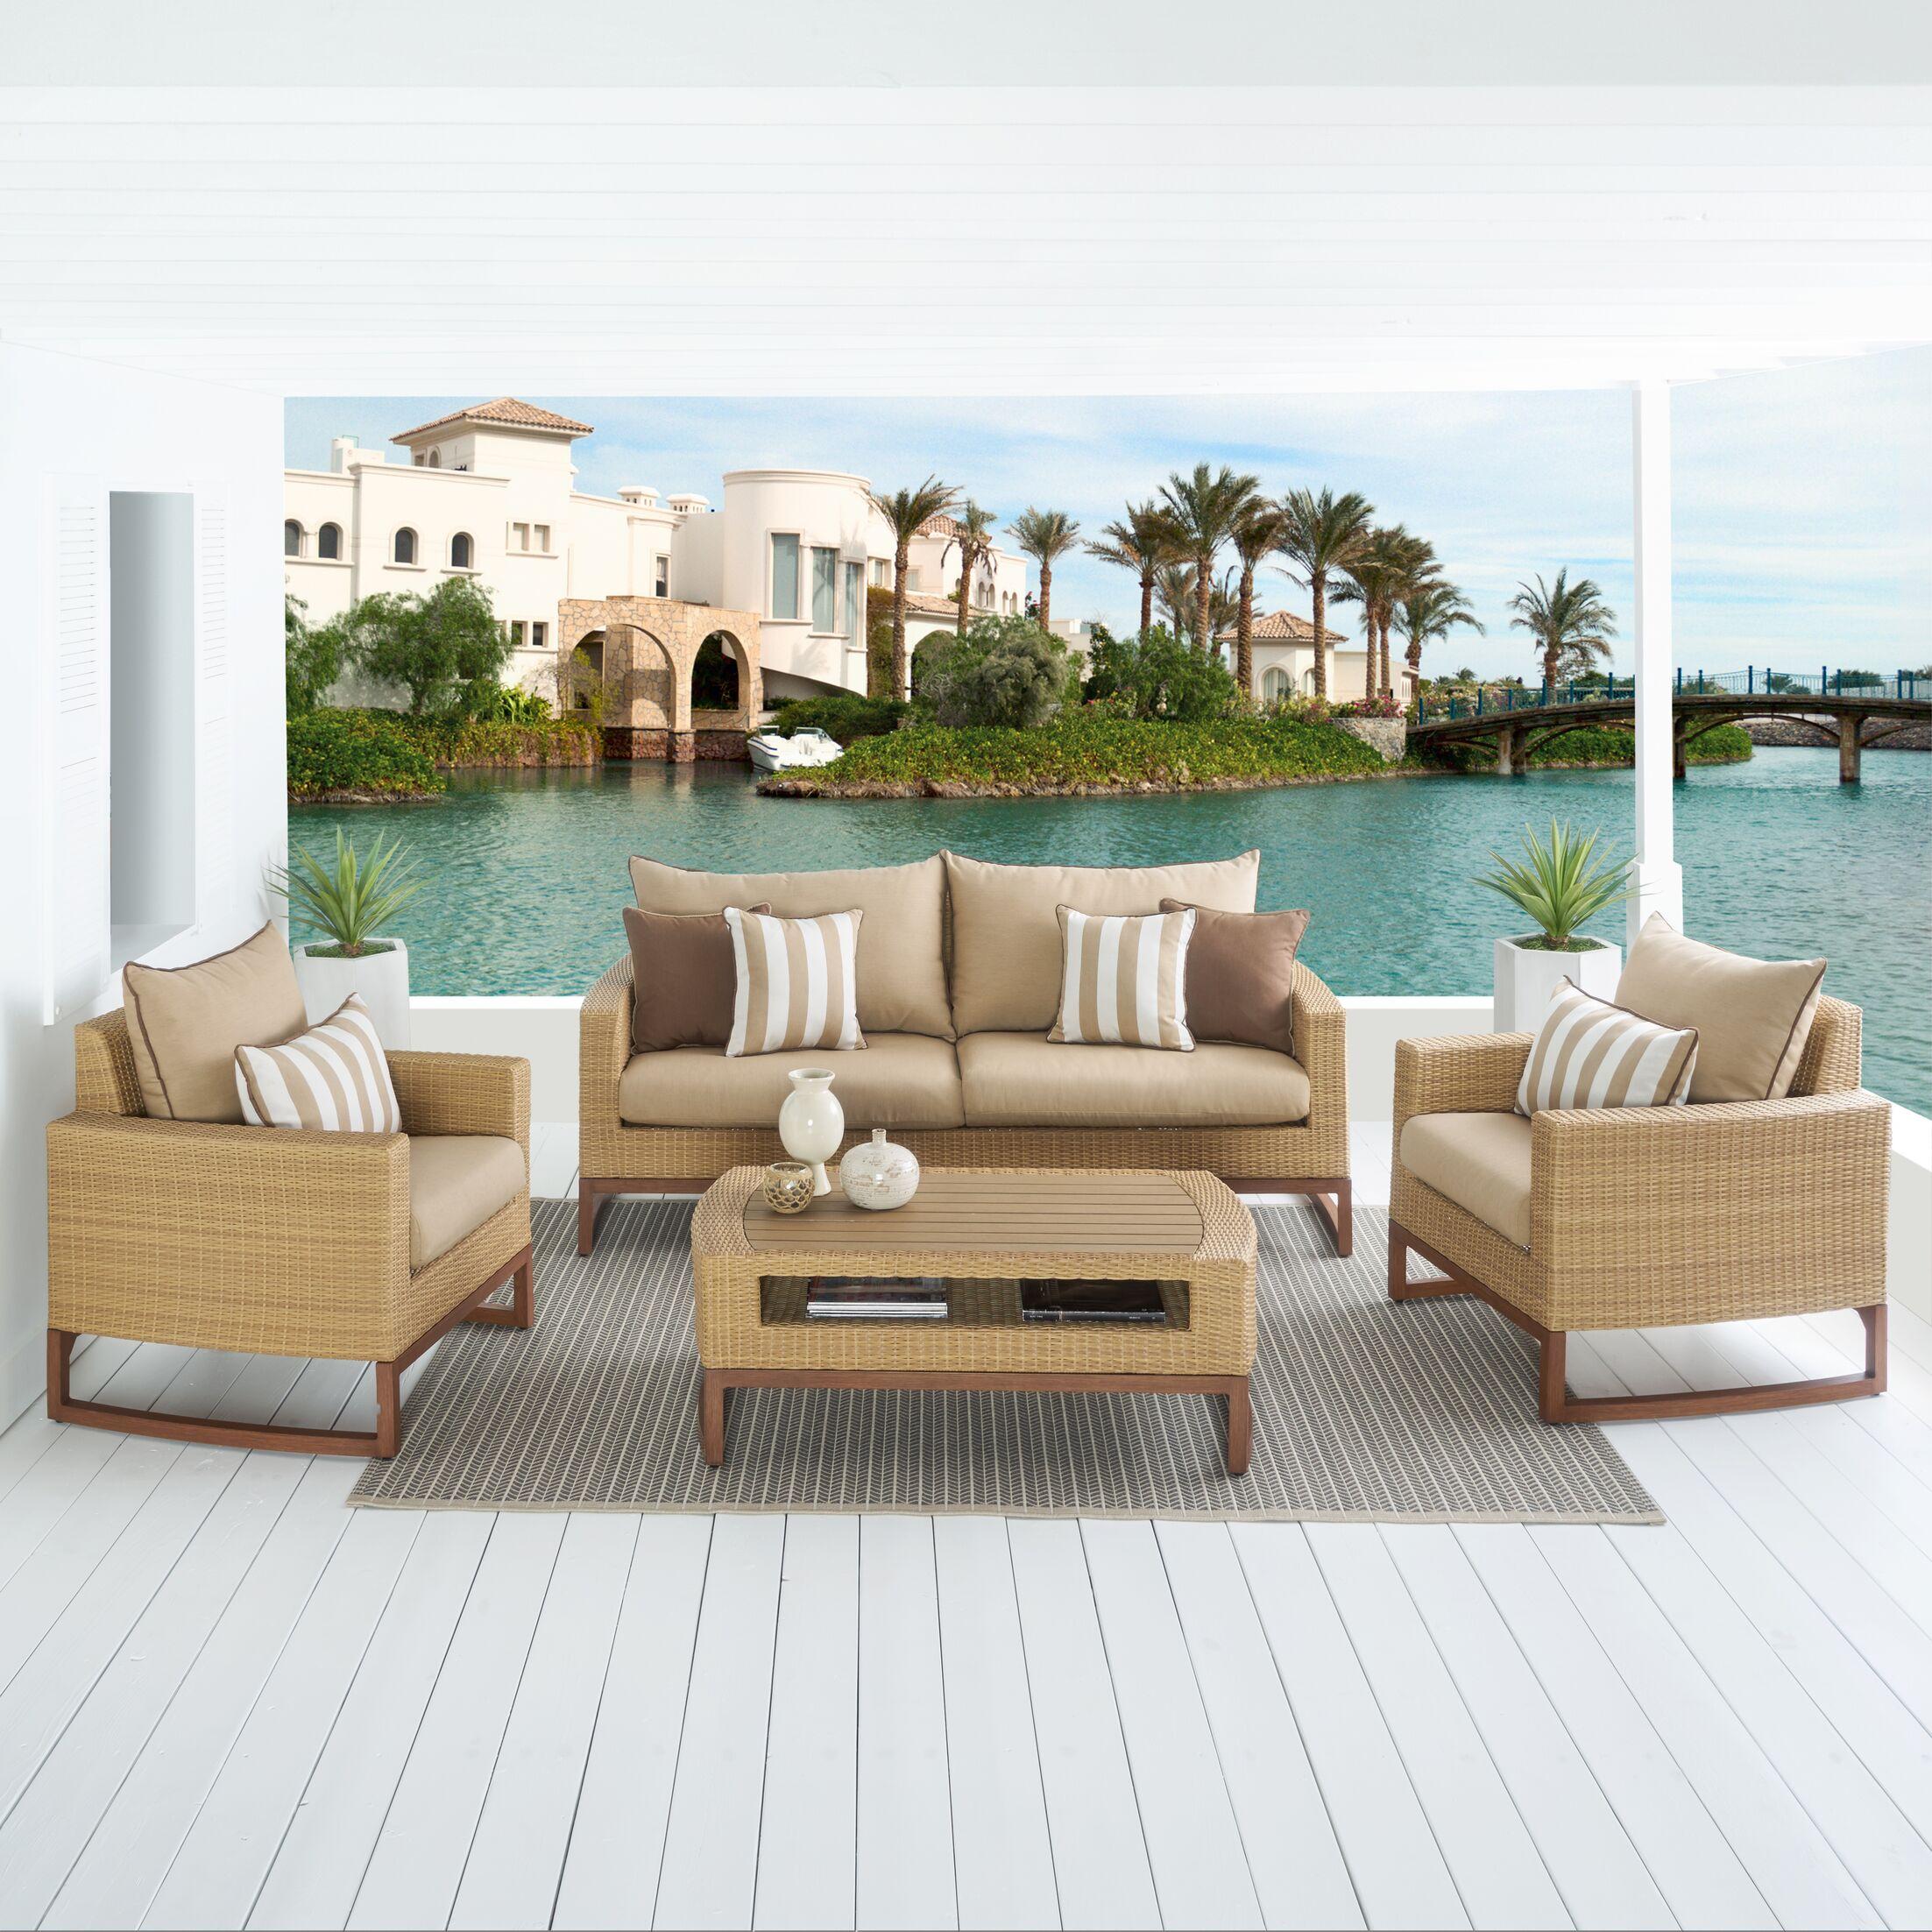 Addison 4 Piece Sunbrella Sofa Set with Cushions Fabric: Maxim Beige